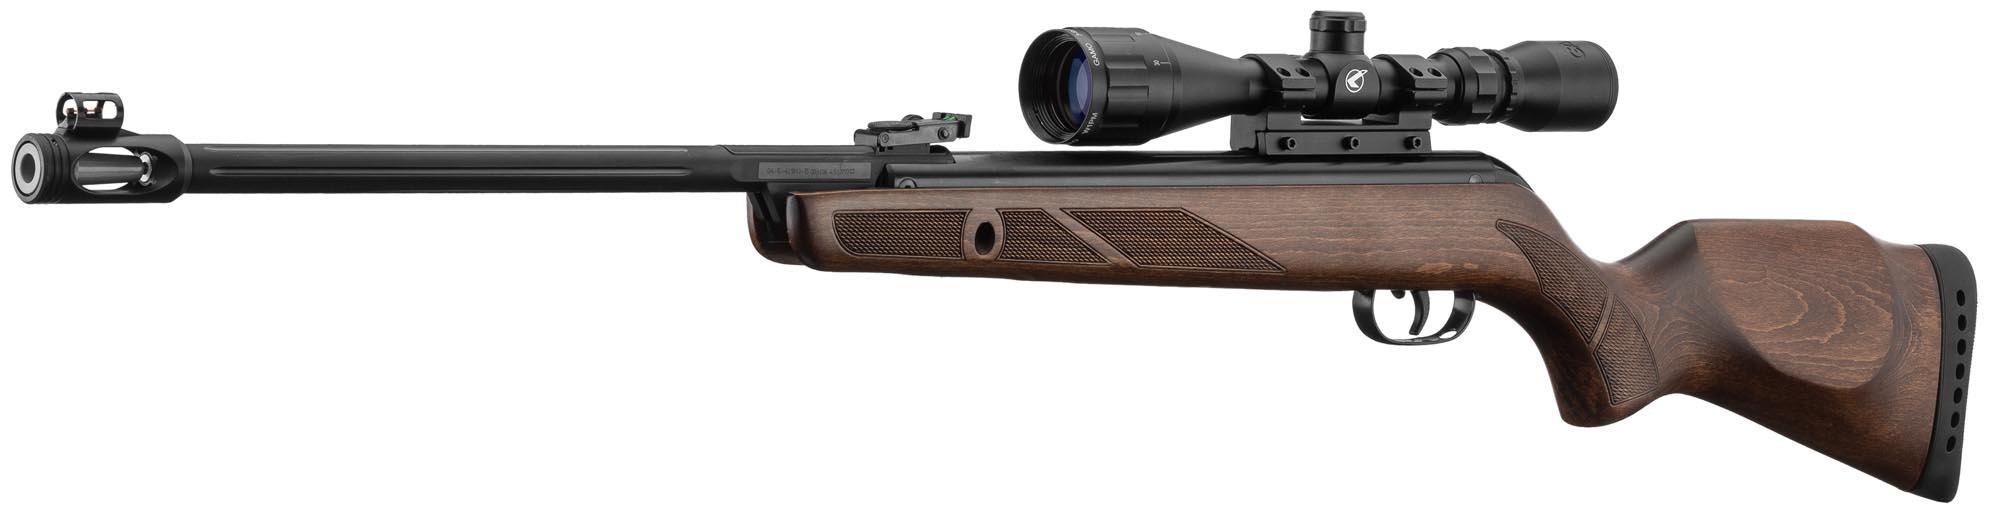 Carabine Hunter 440 Wr As Avec Lunette3 40 Gamo 9 X GMqSzjLUVp